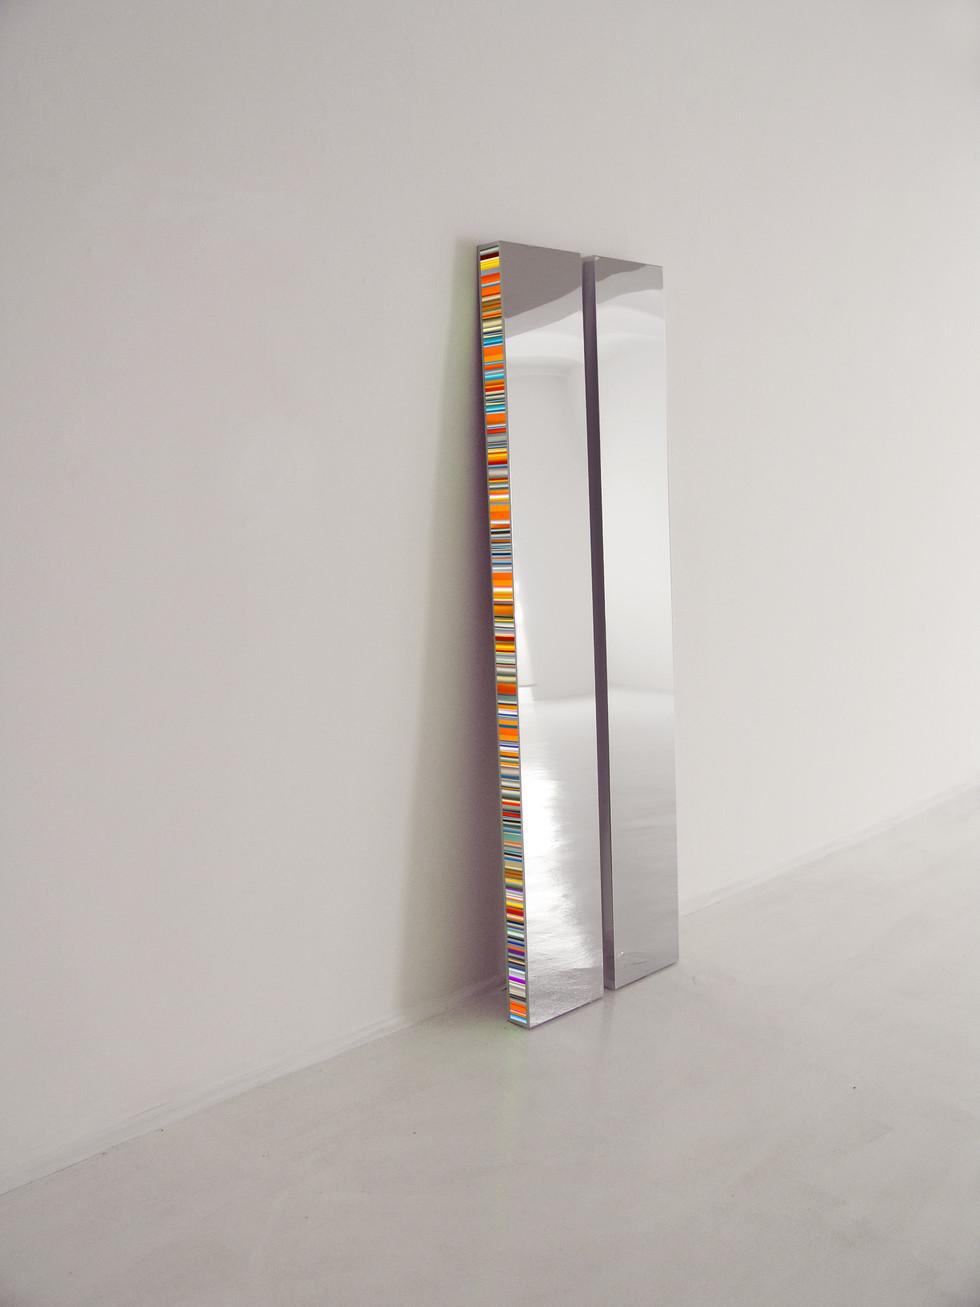 Twin Edelstahl Plexiglas LED 200 x 30 x 8 cm